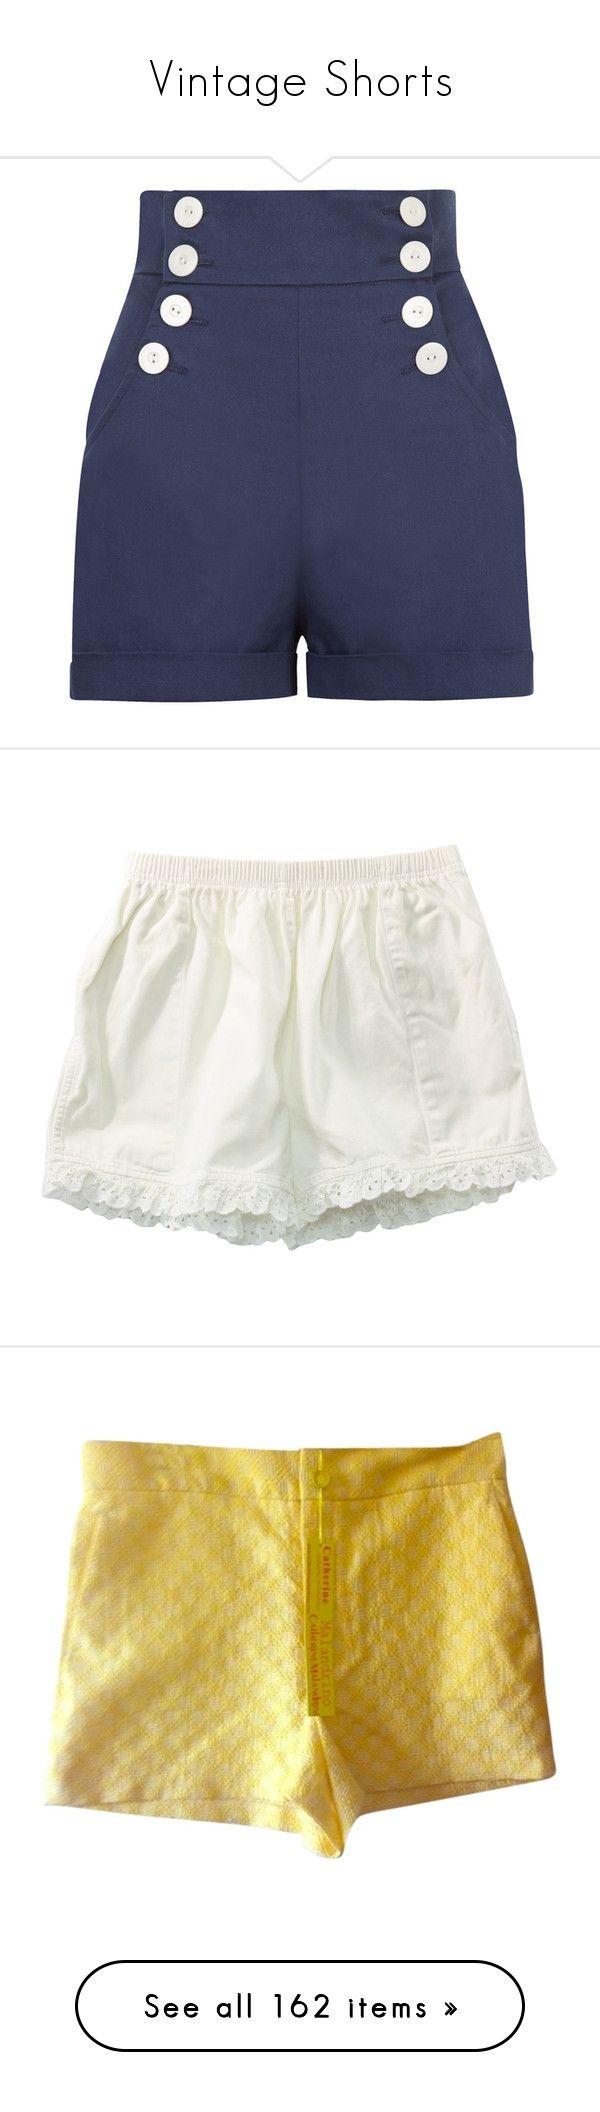 """Vintage Shorts"" by mickjaggerismydrug ❤ liked on Polyvore featuring shorts, bottoms, pants, short, navy sailor shorts, high waisted navy shorts, high waisted shorts, sailor shorts, high waisted pinup shorts and clothing - shorts"